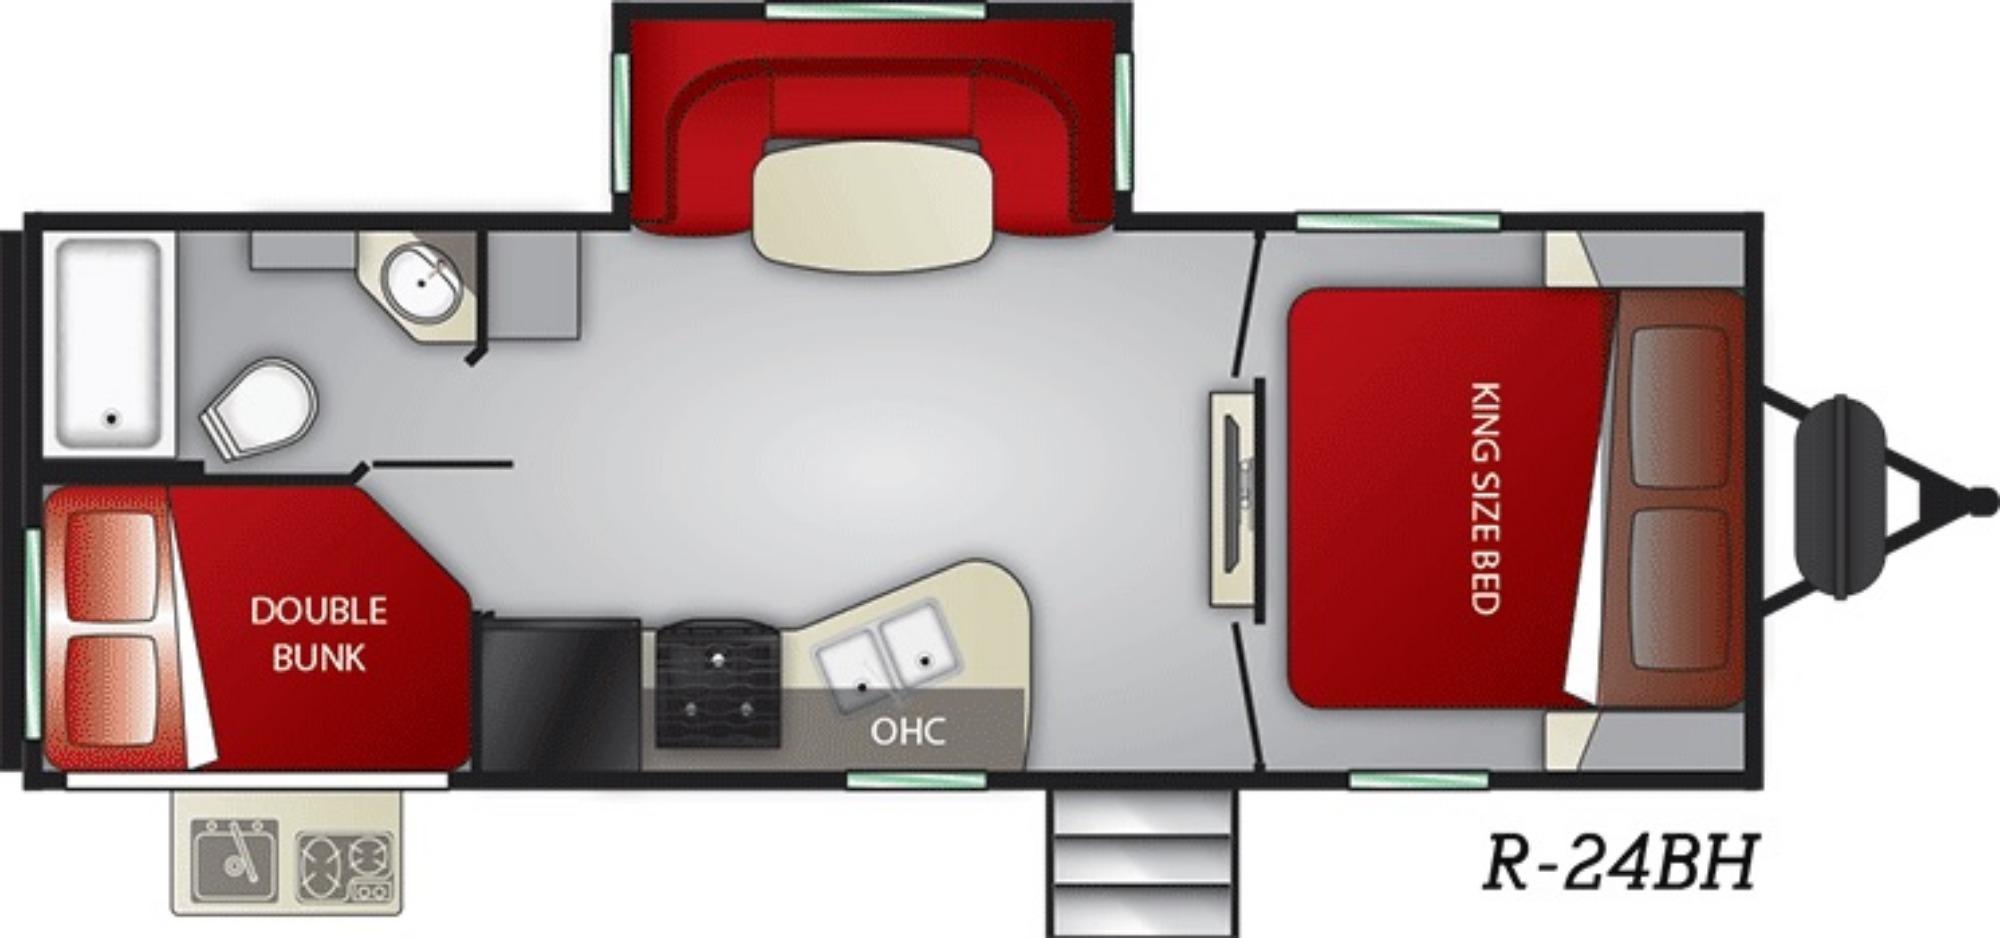 Exterior : 2019-CRUISER RV-24BH